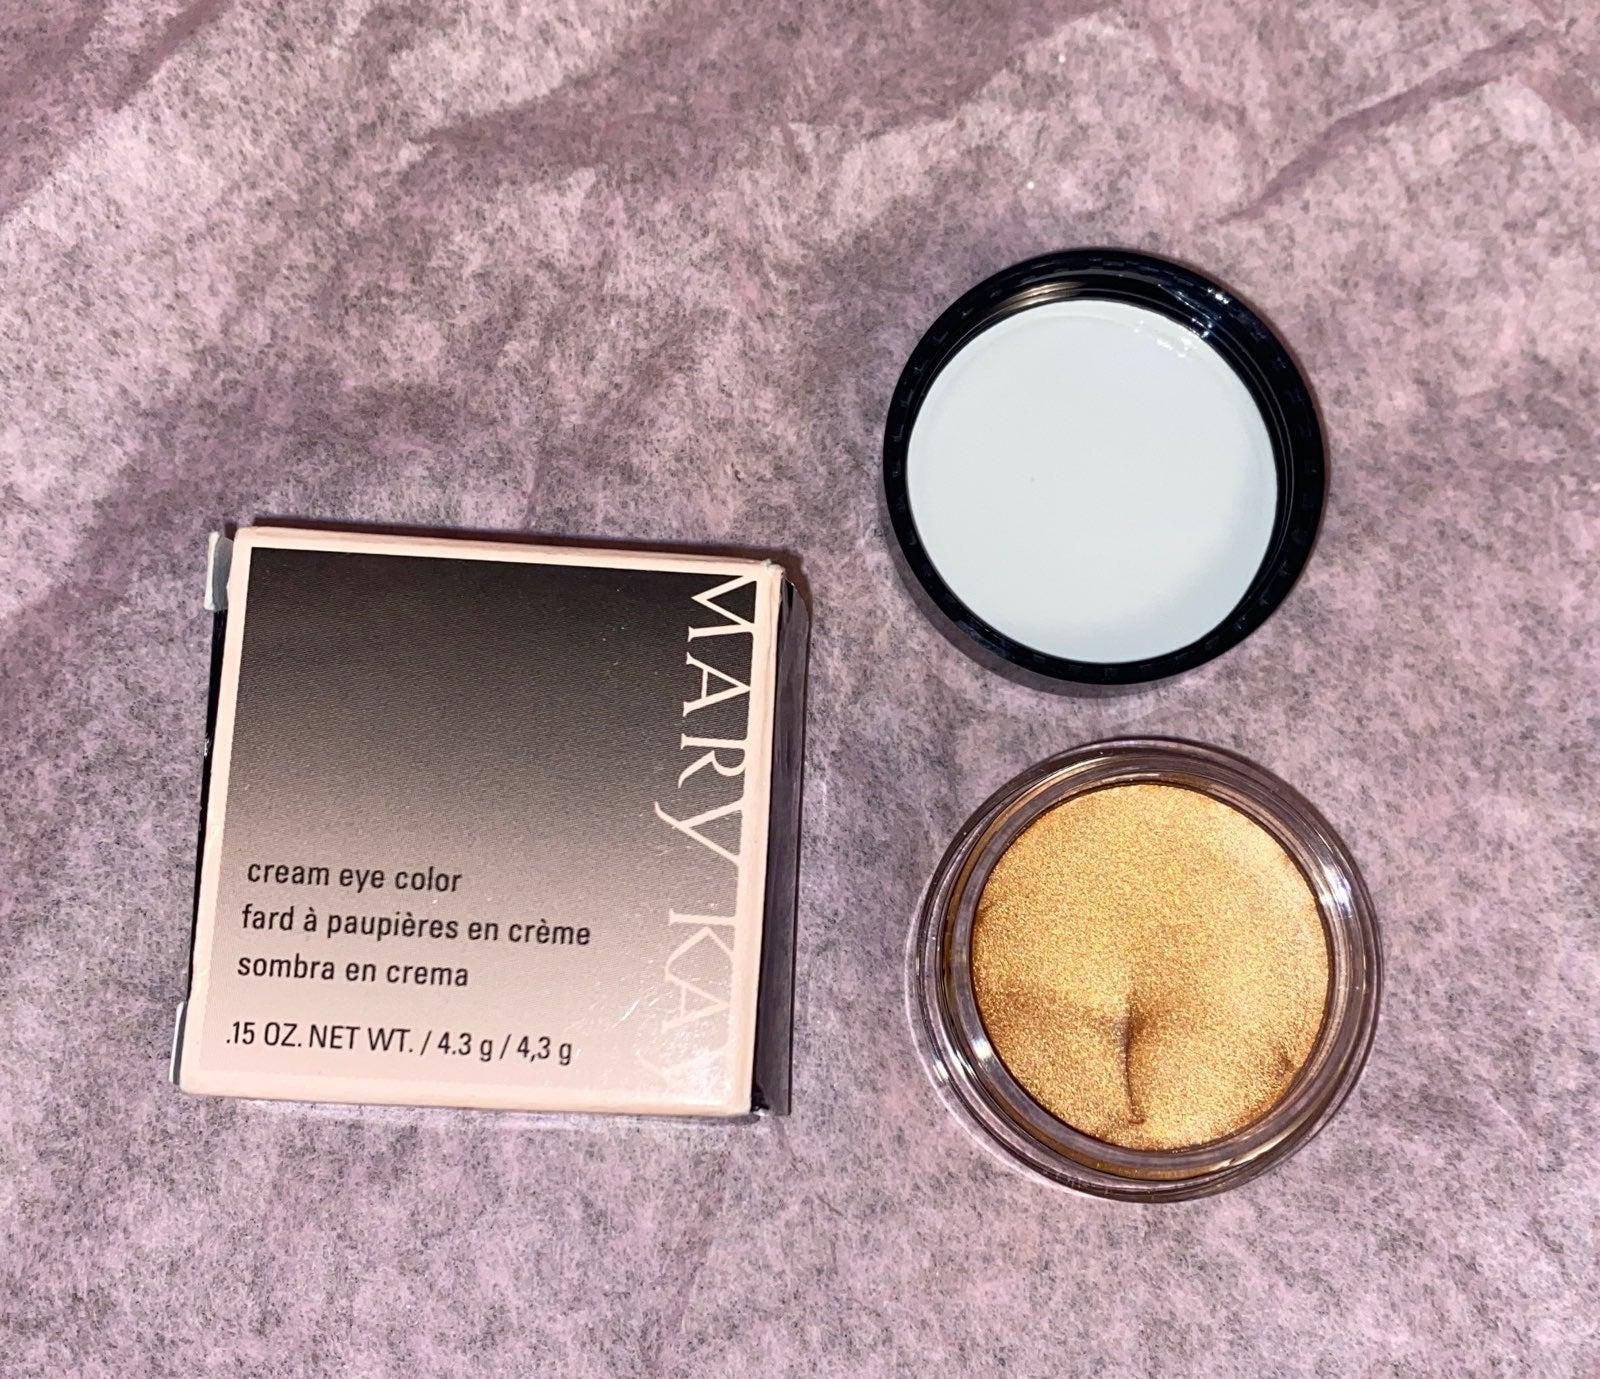 Mary Kay Cream Eye Color